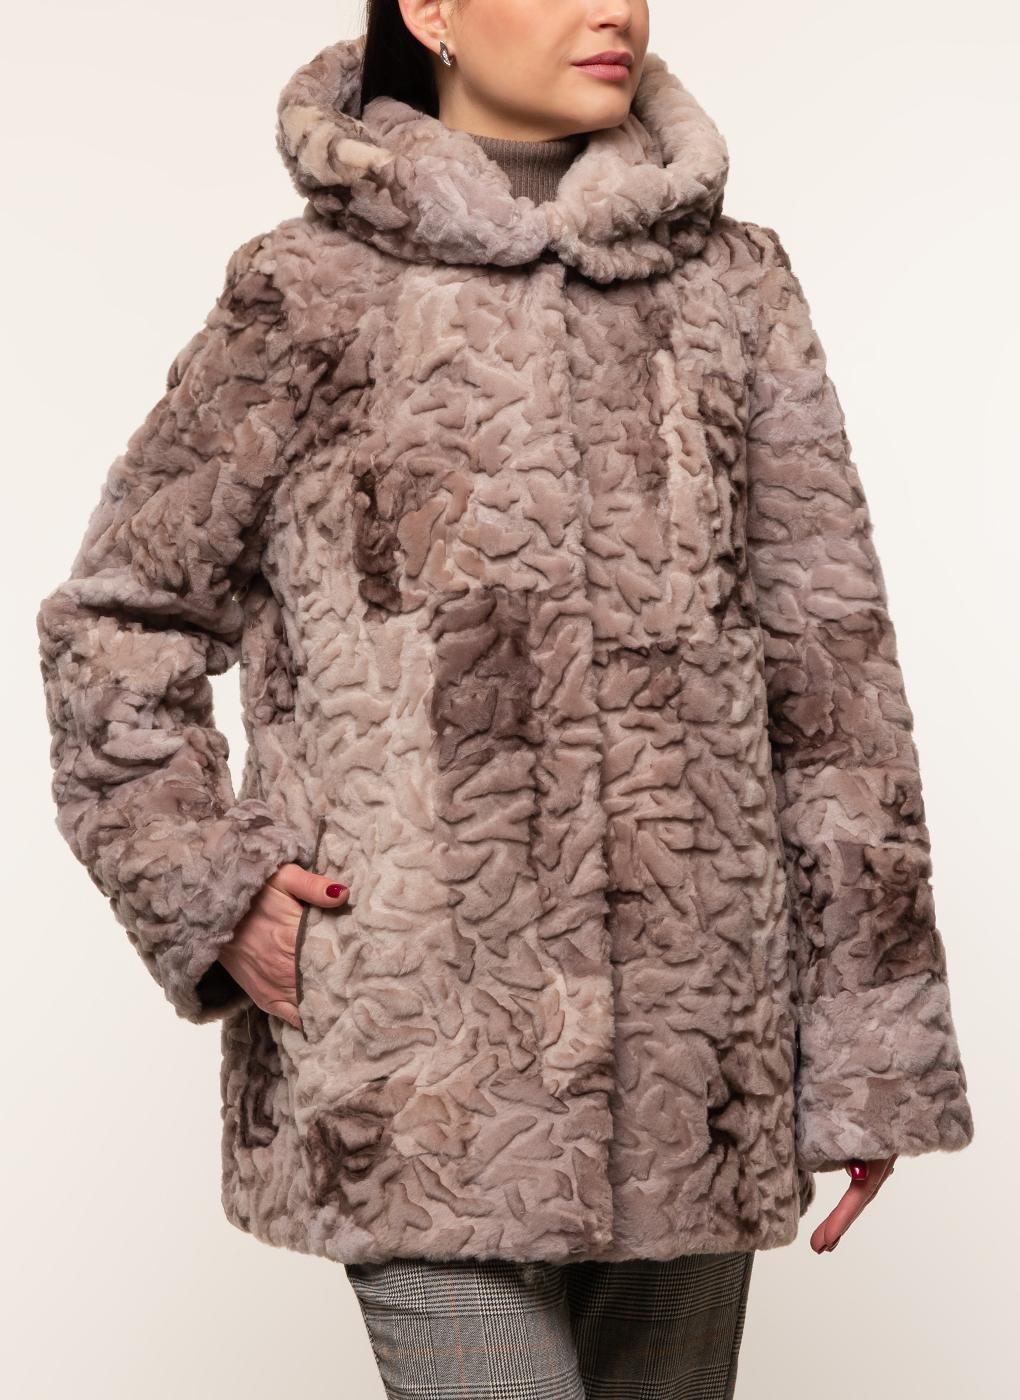 Куртка из овчины 09, Dzhanbekoff фото